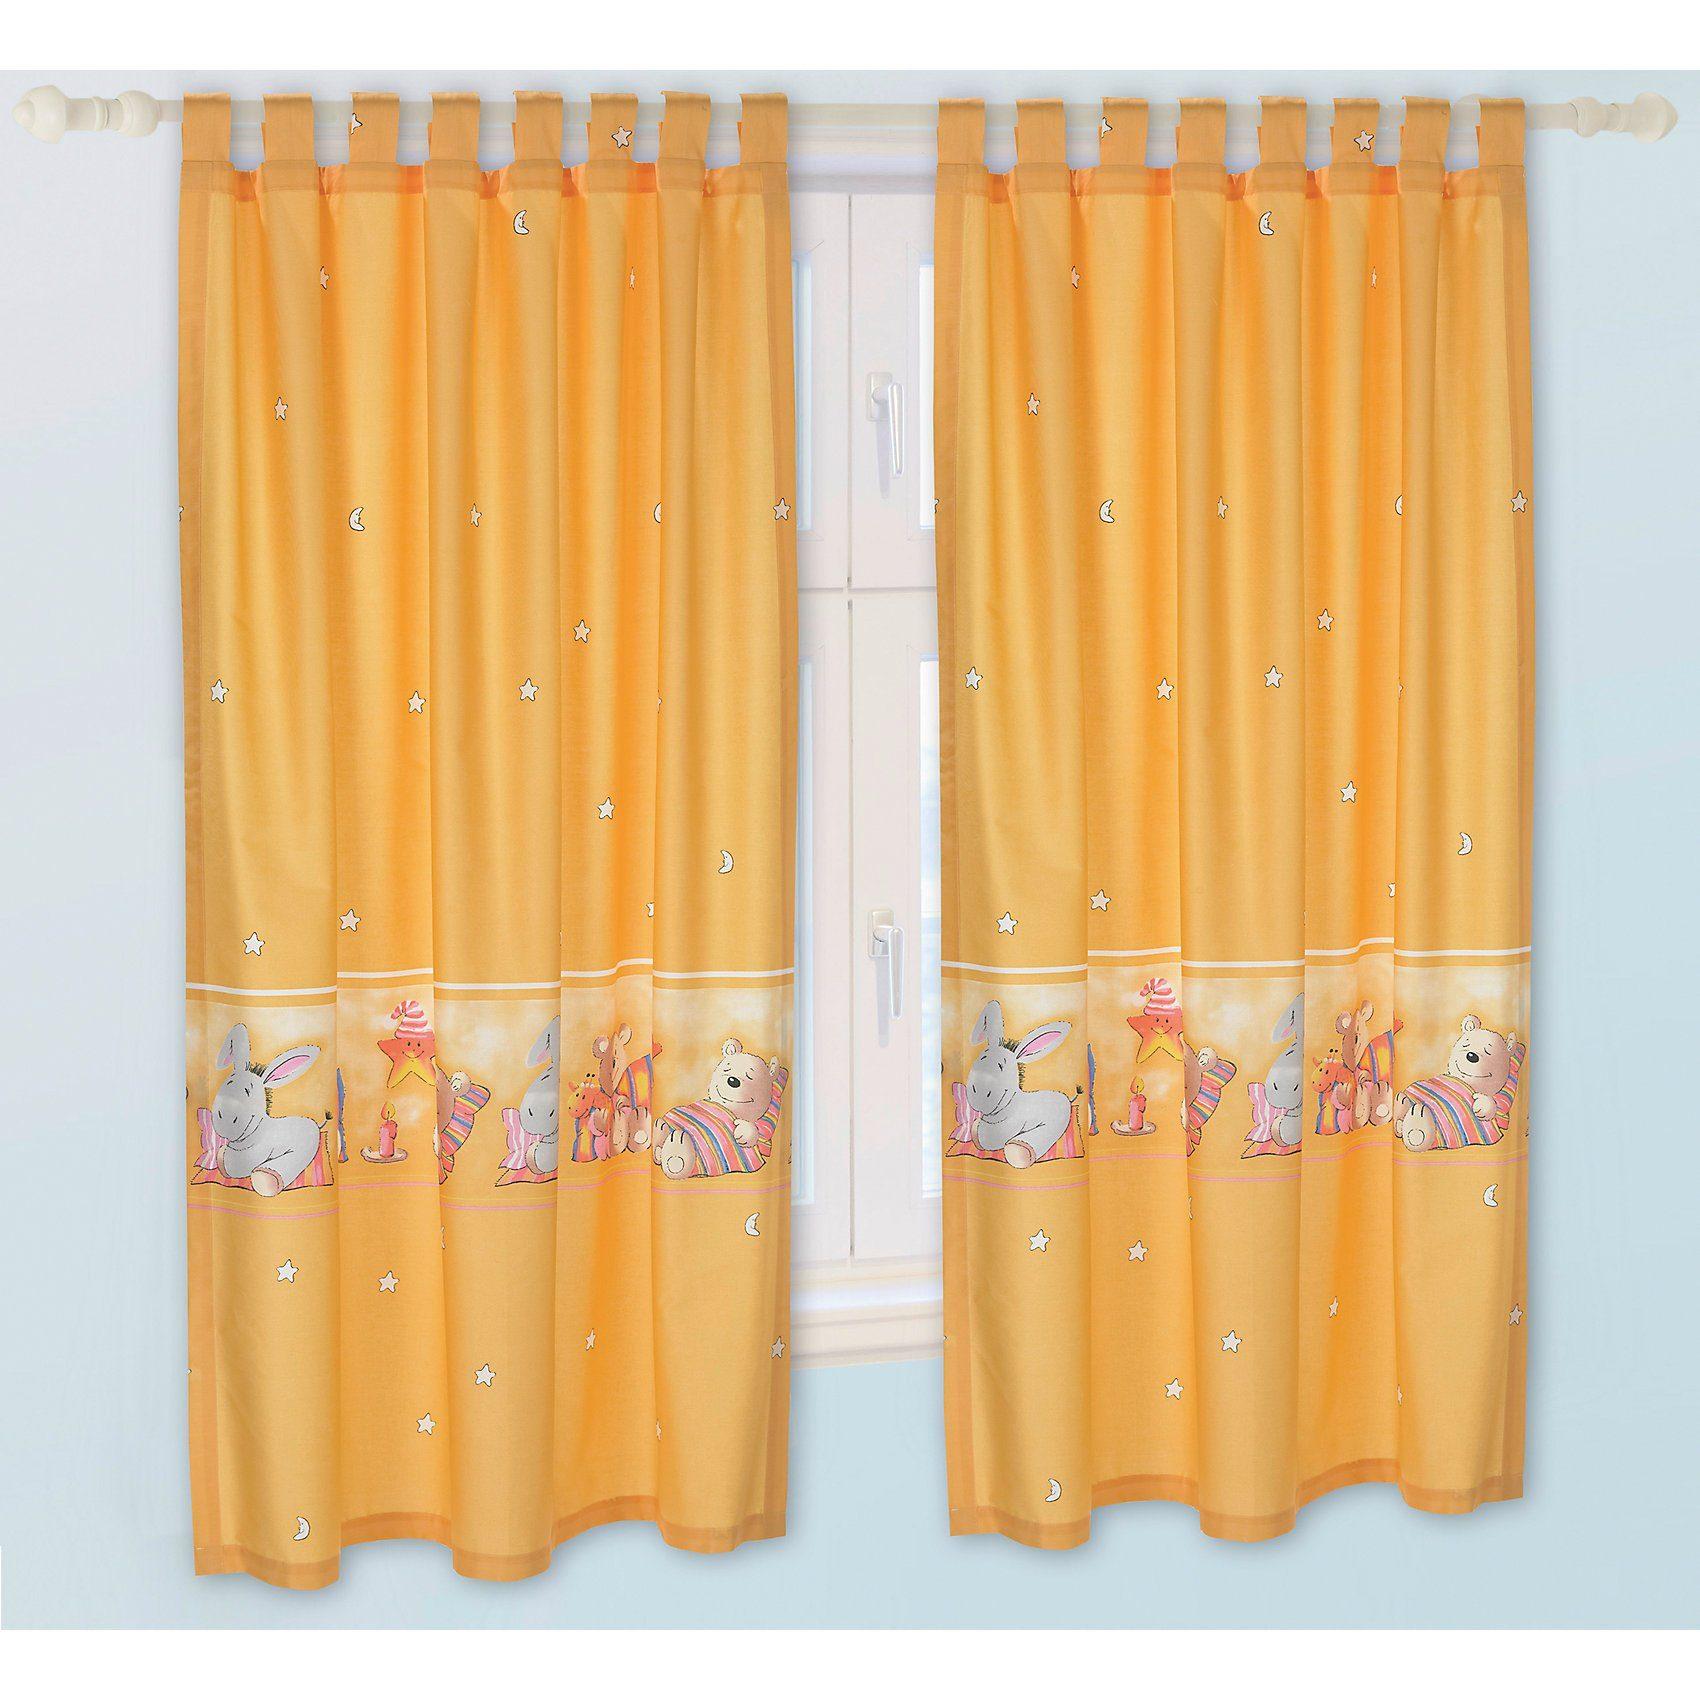 Alvi Vorhang Set Donkey, gelb, je 130 x 150 cm (2 Schals)